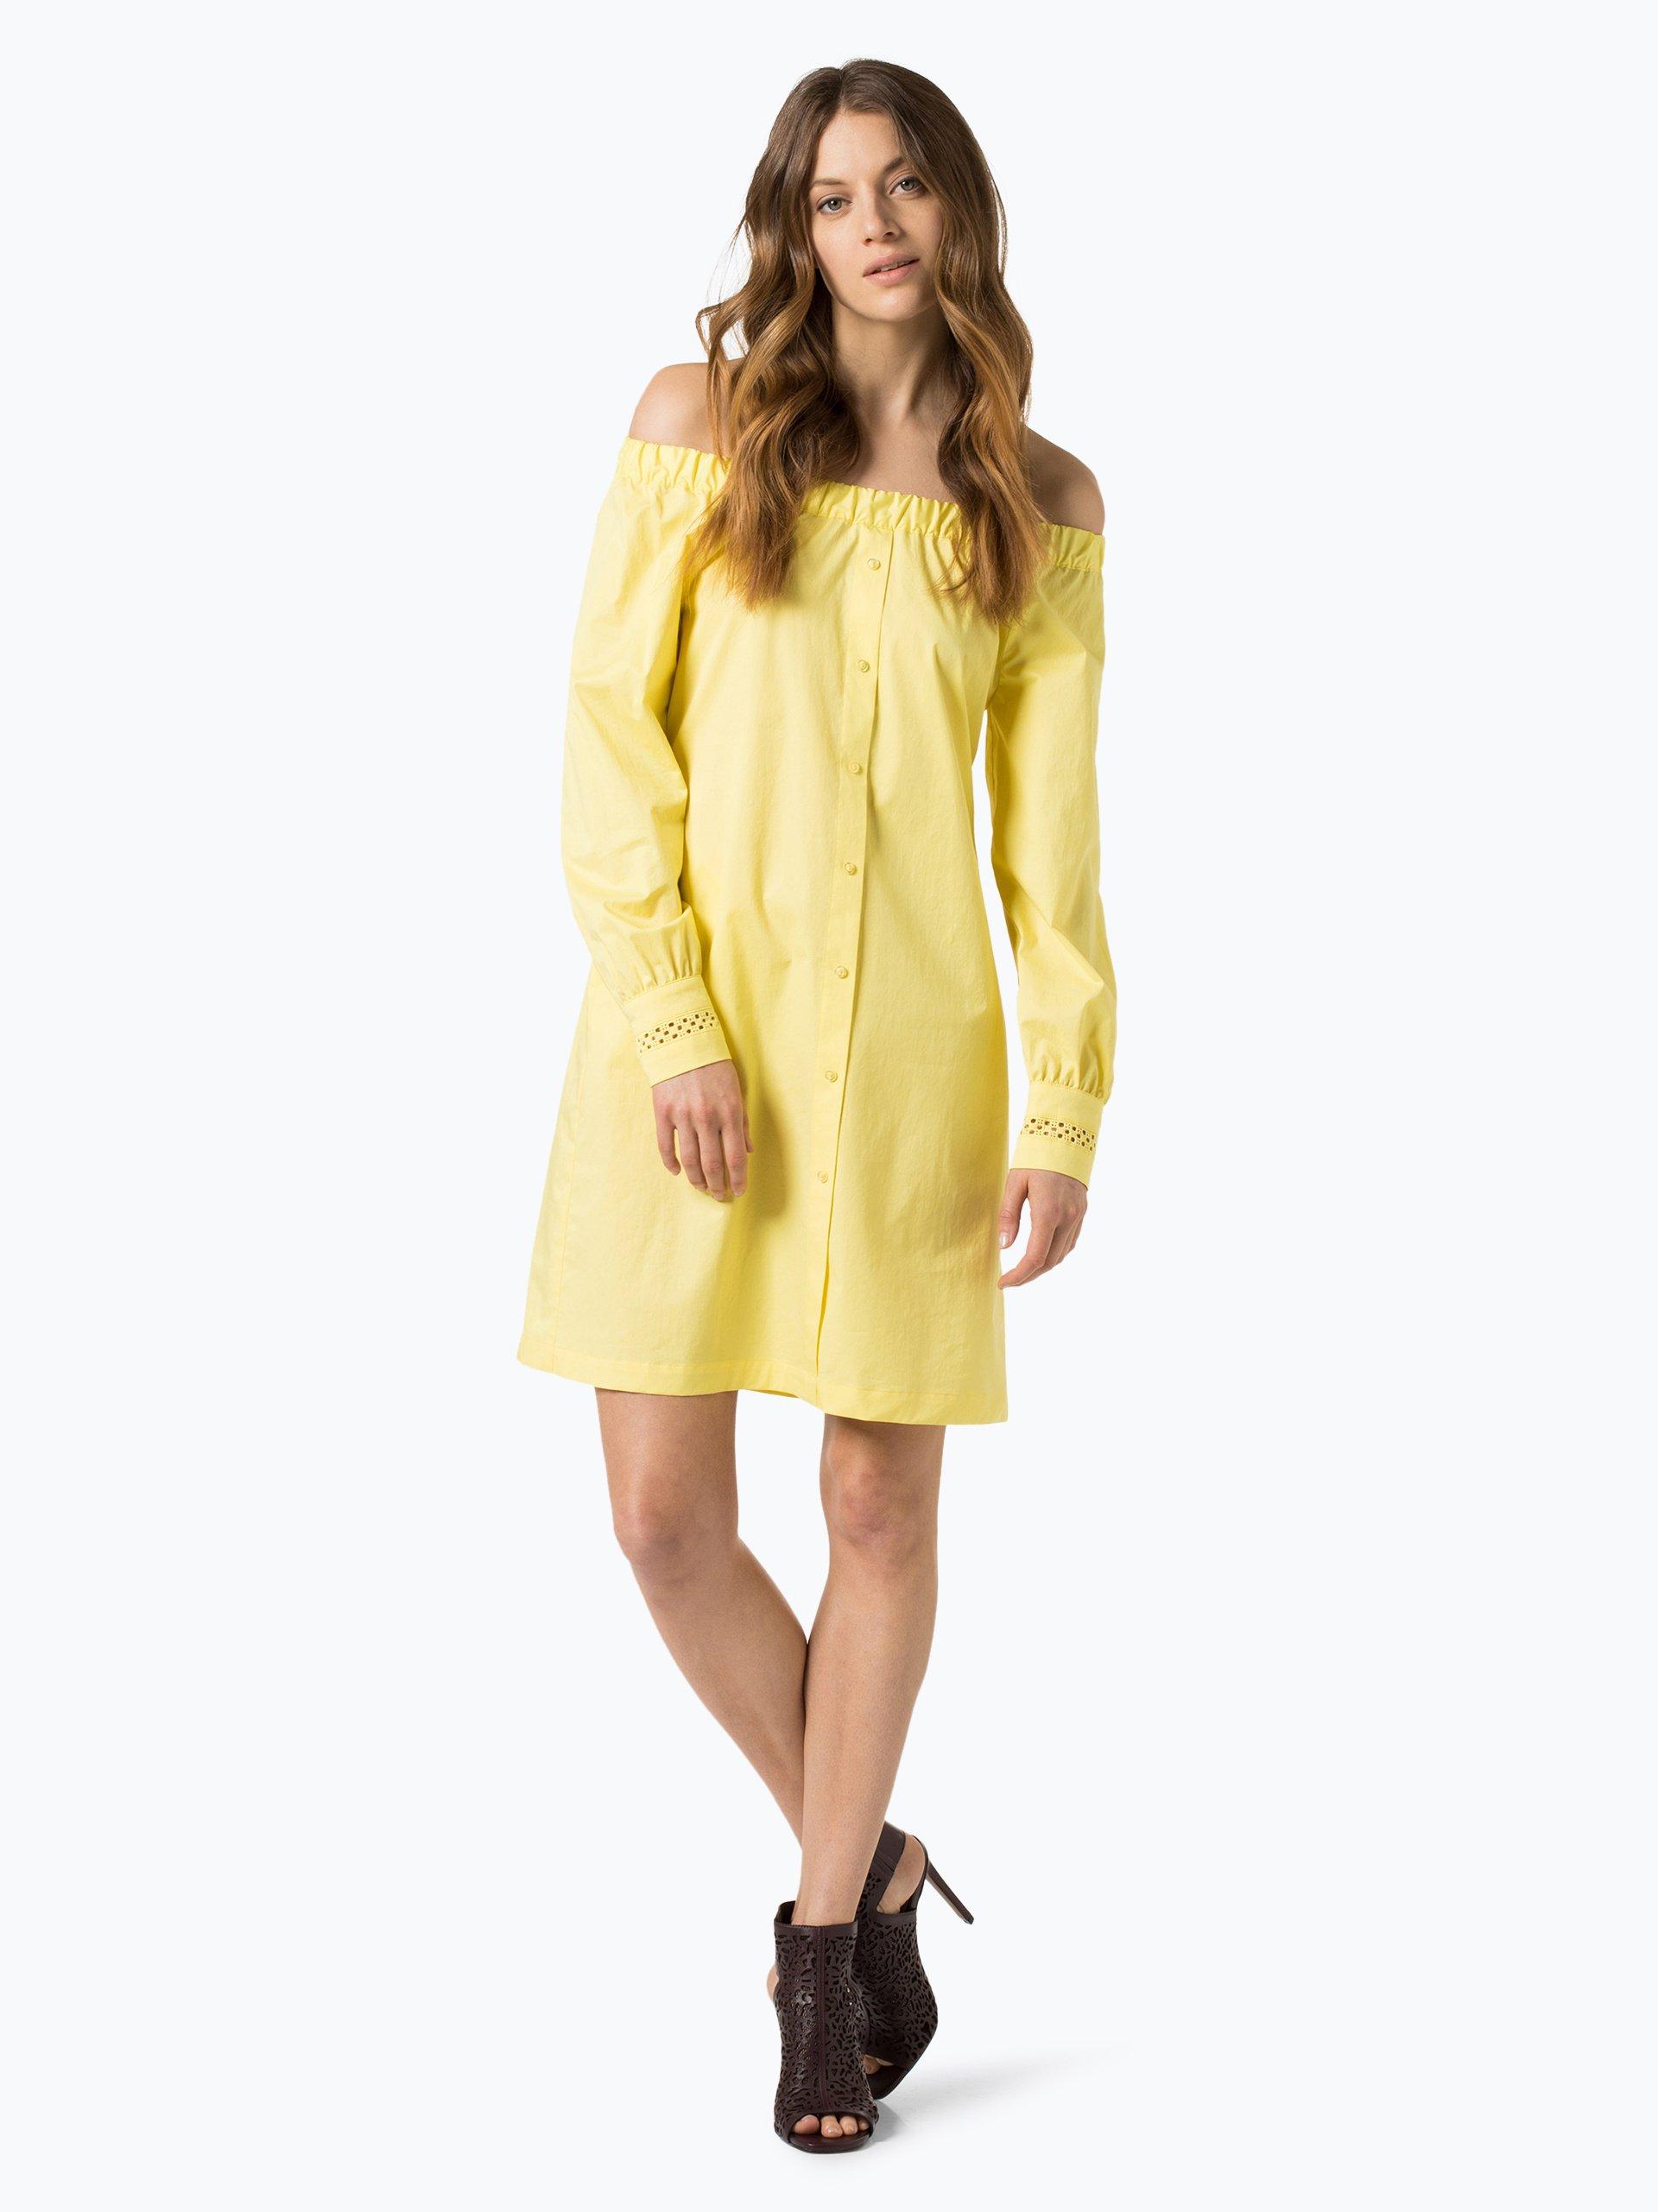 marie lund damen kleid gelb uni online kaufen vangraaf com. Black Bedroom Furniture Sets. Home Design Ideas